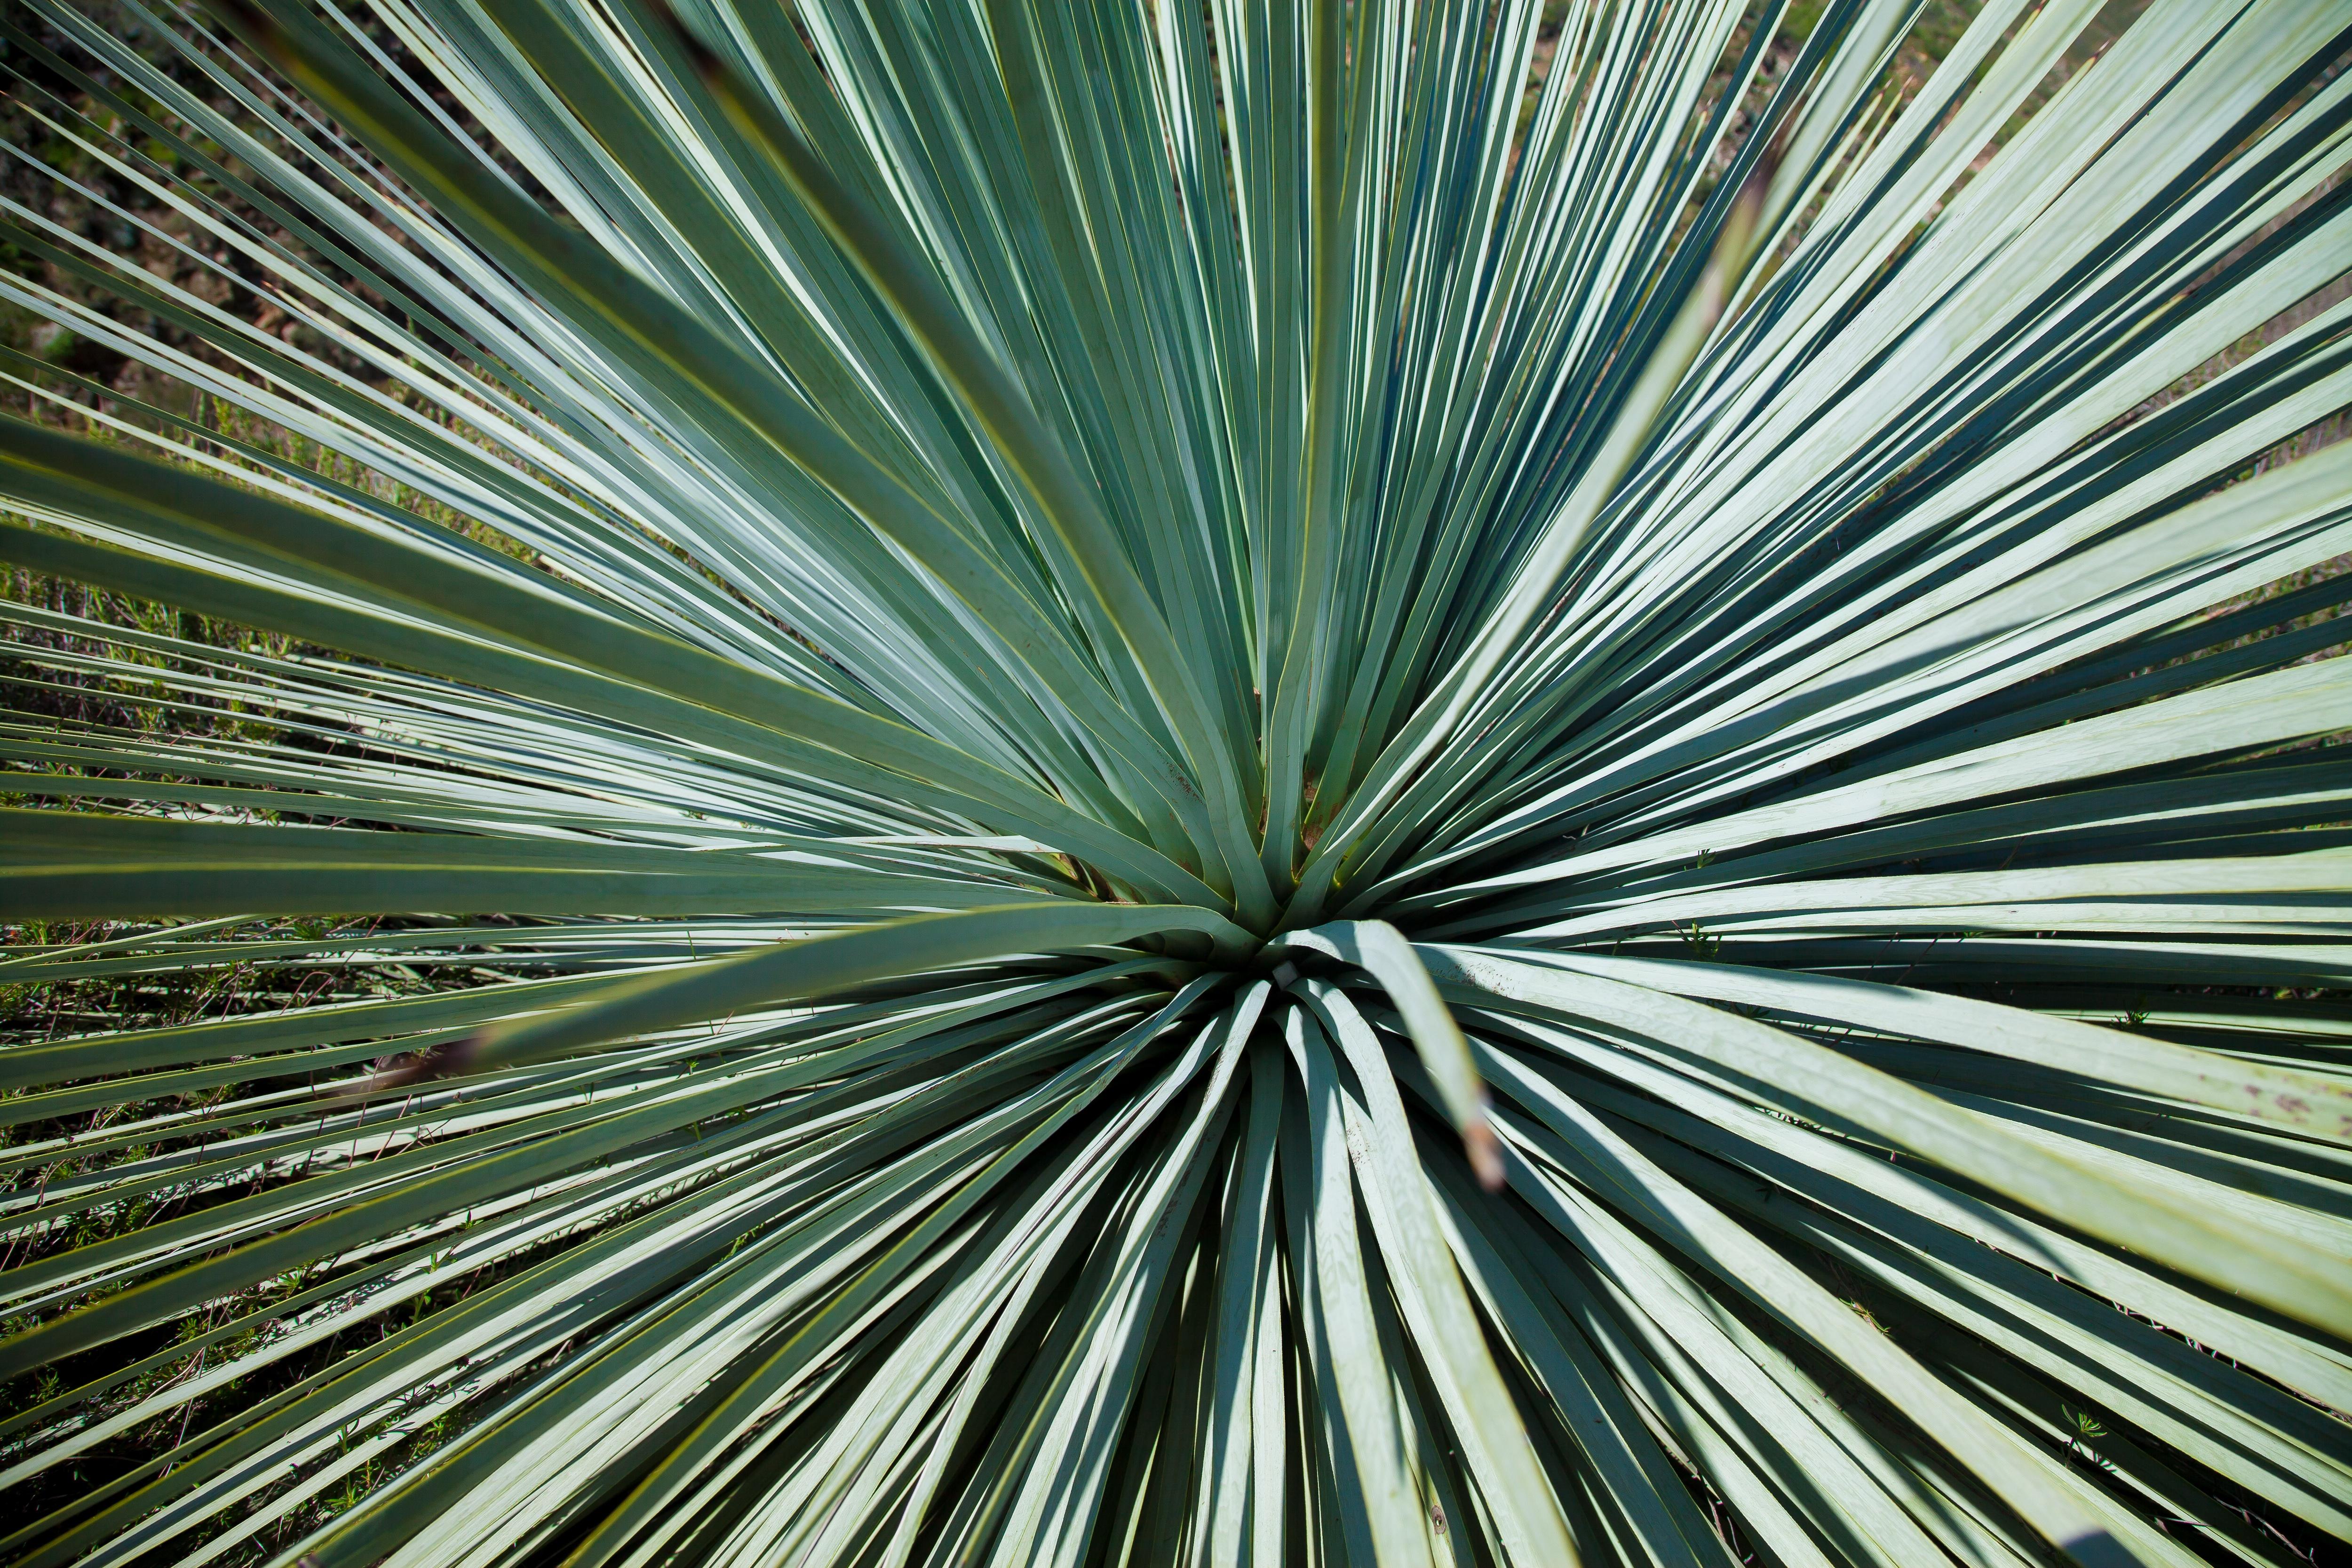 Fotos gratis : árbol, hoja, flor, línea, verde, botánica, flora, de ...